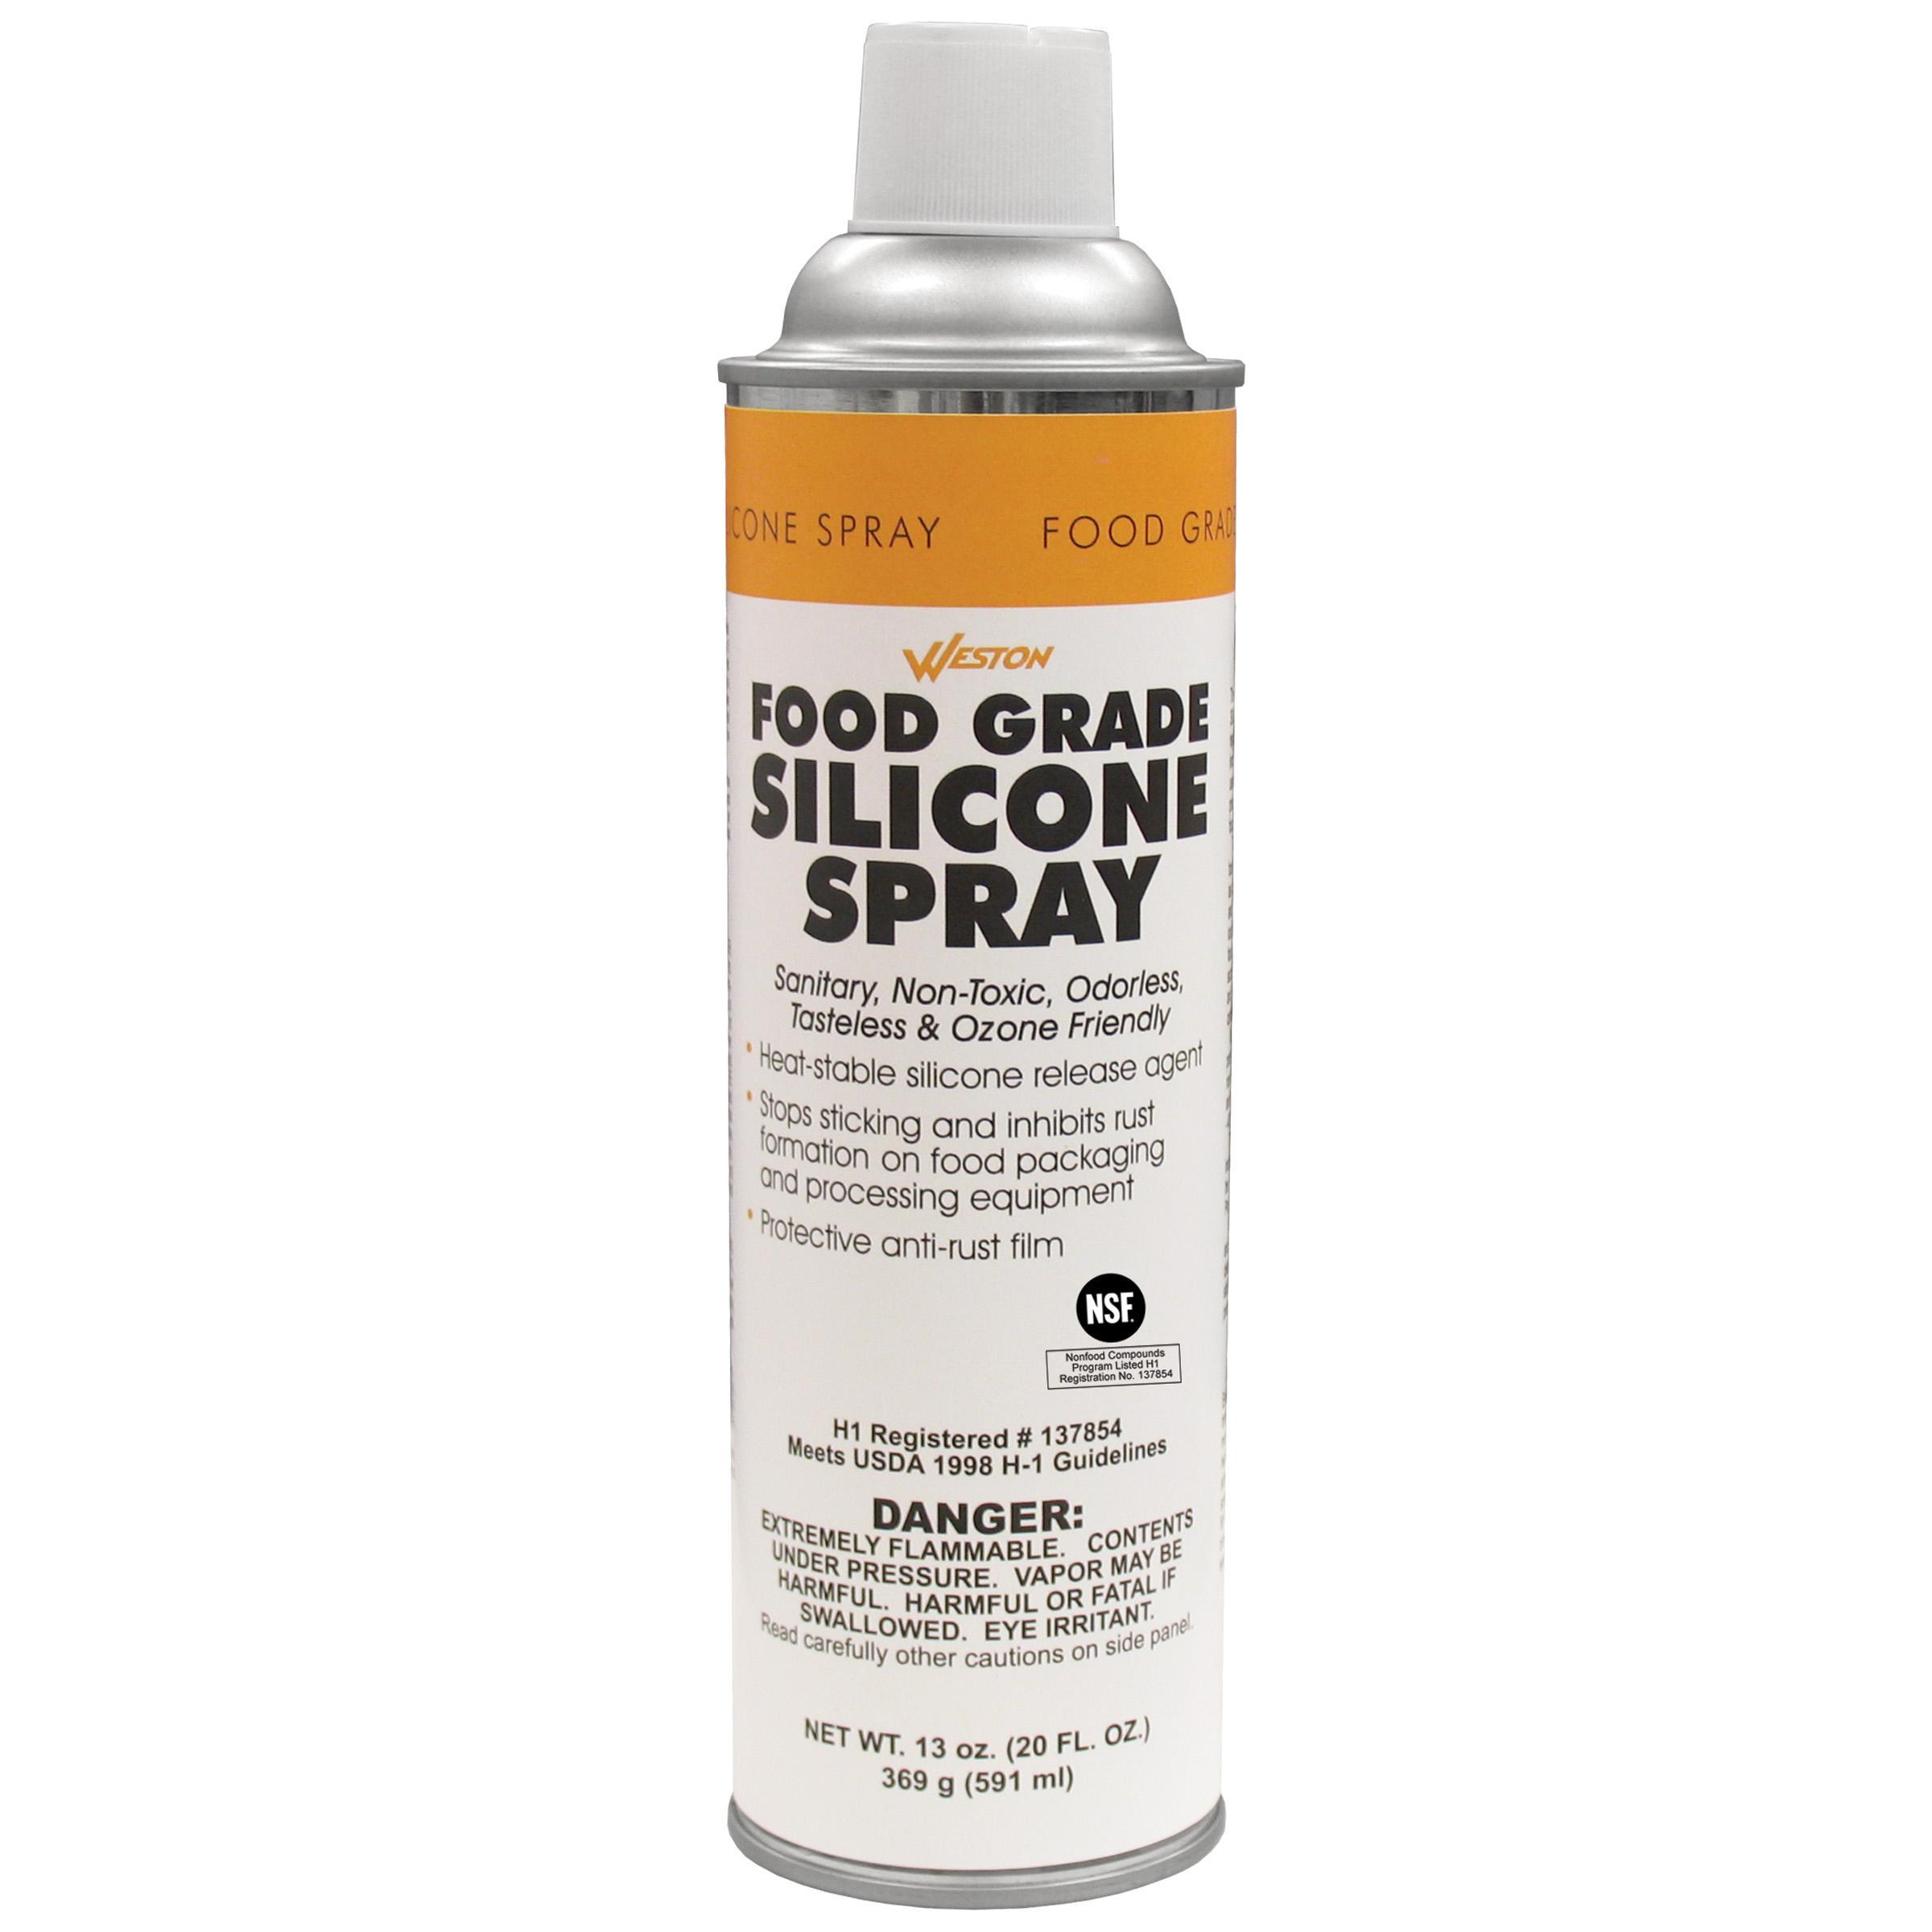 Silicone Spray Lubricant >> Weston 03 0101 W Food Grade Silicone Spray 13oz Can For For Lubrication And Storage